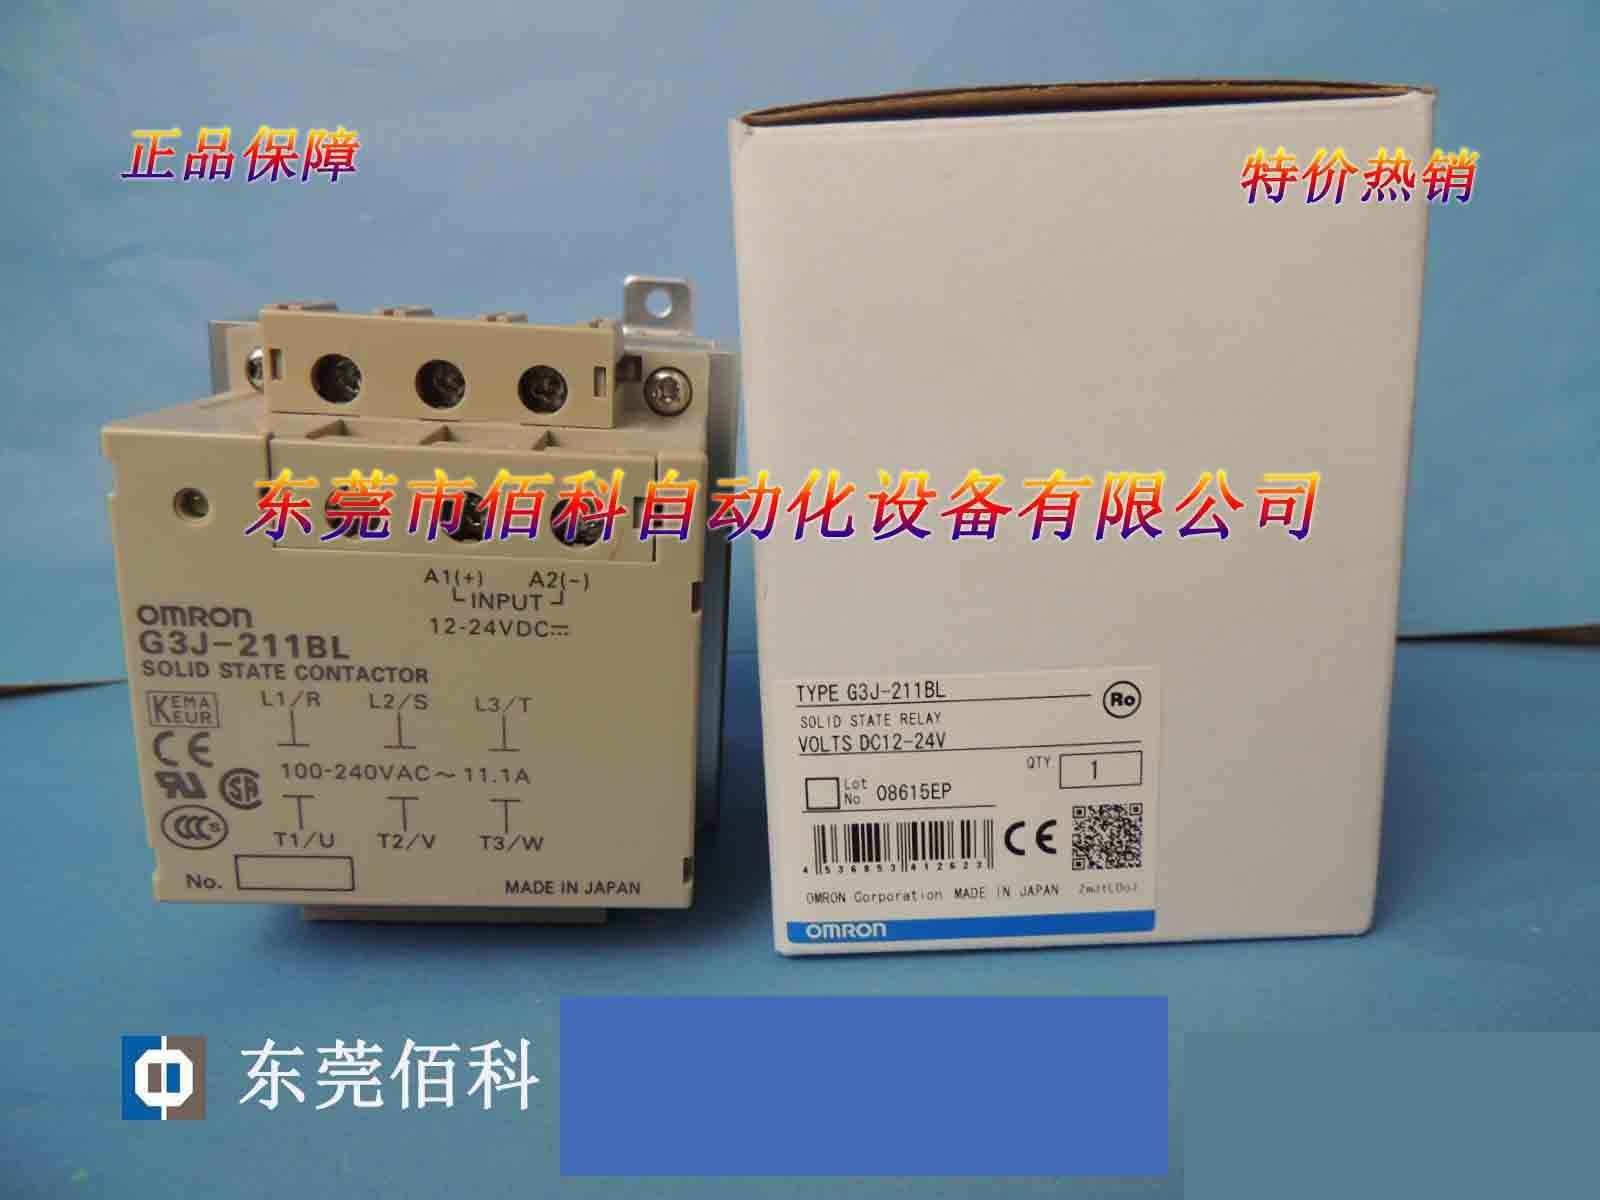 New Relay G3J-211BL DC24VNew Relay G3J-211BL DC24V